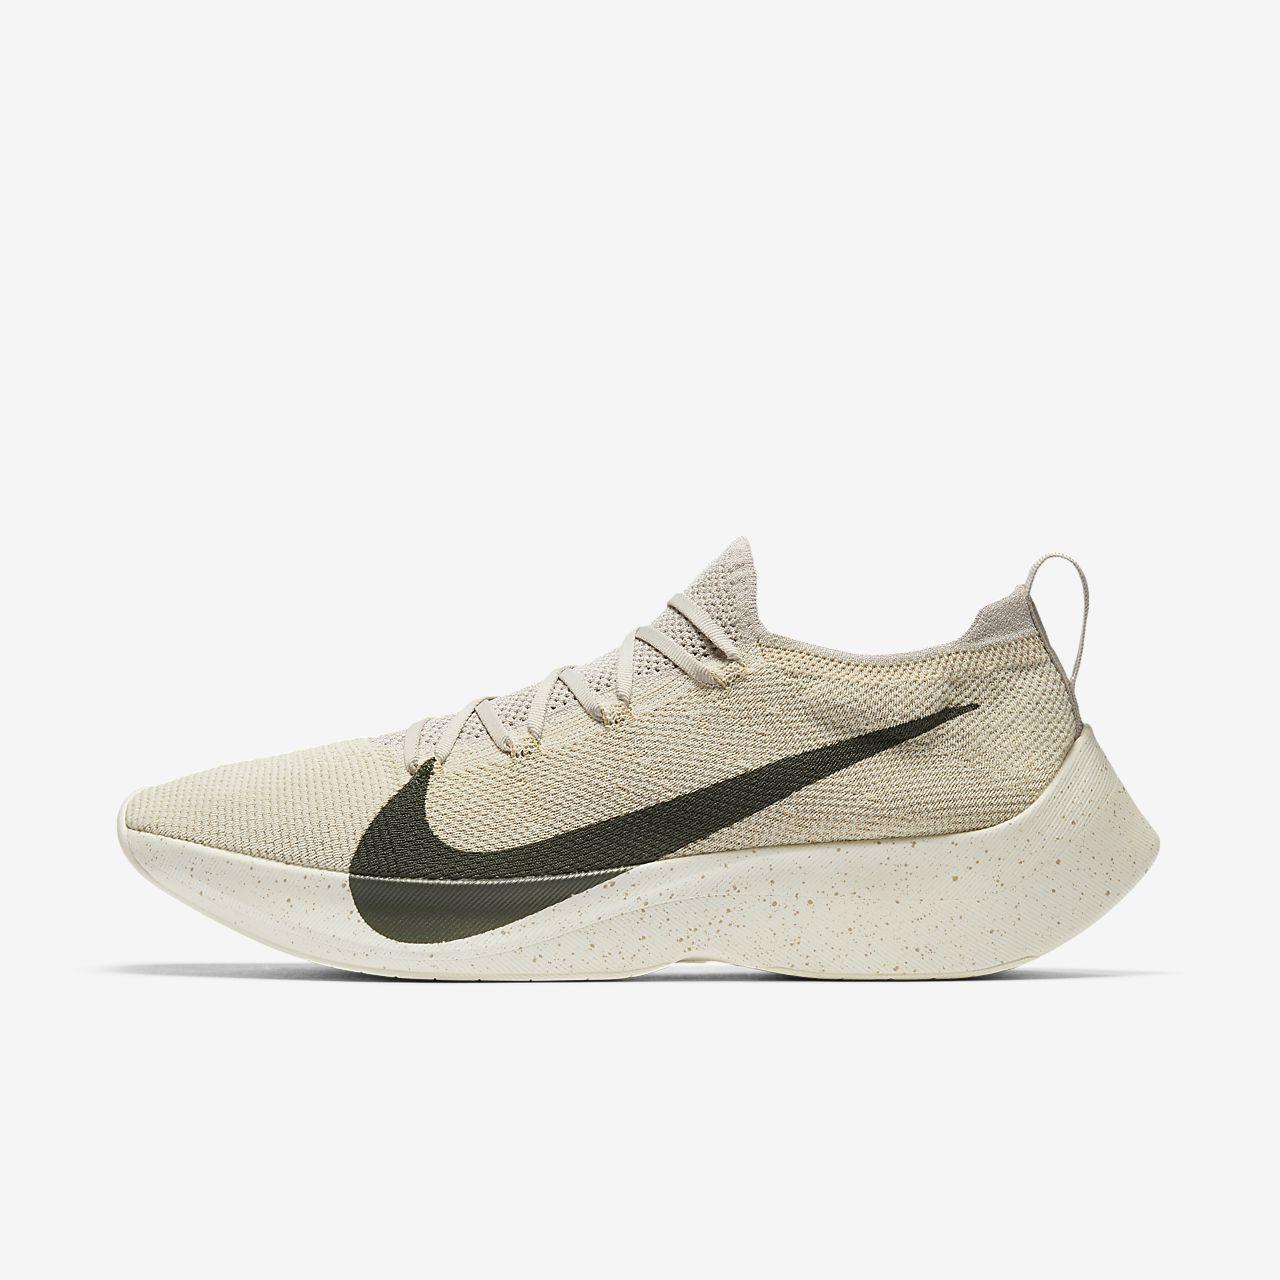 abc32ef5173a Nike React Vapor Street Flyknit Men s Shoe. Nike.com GB